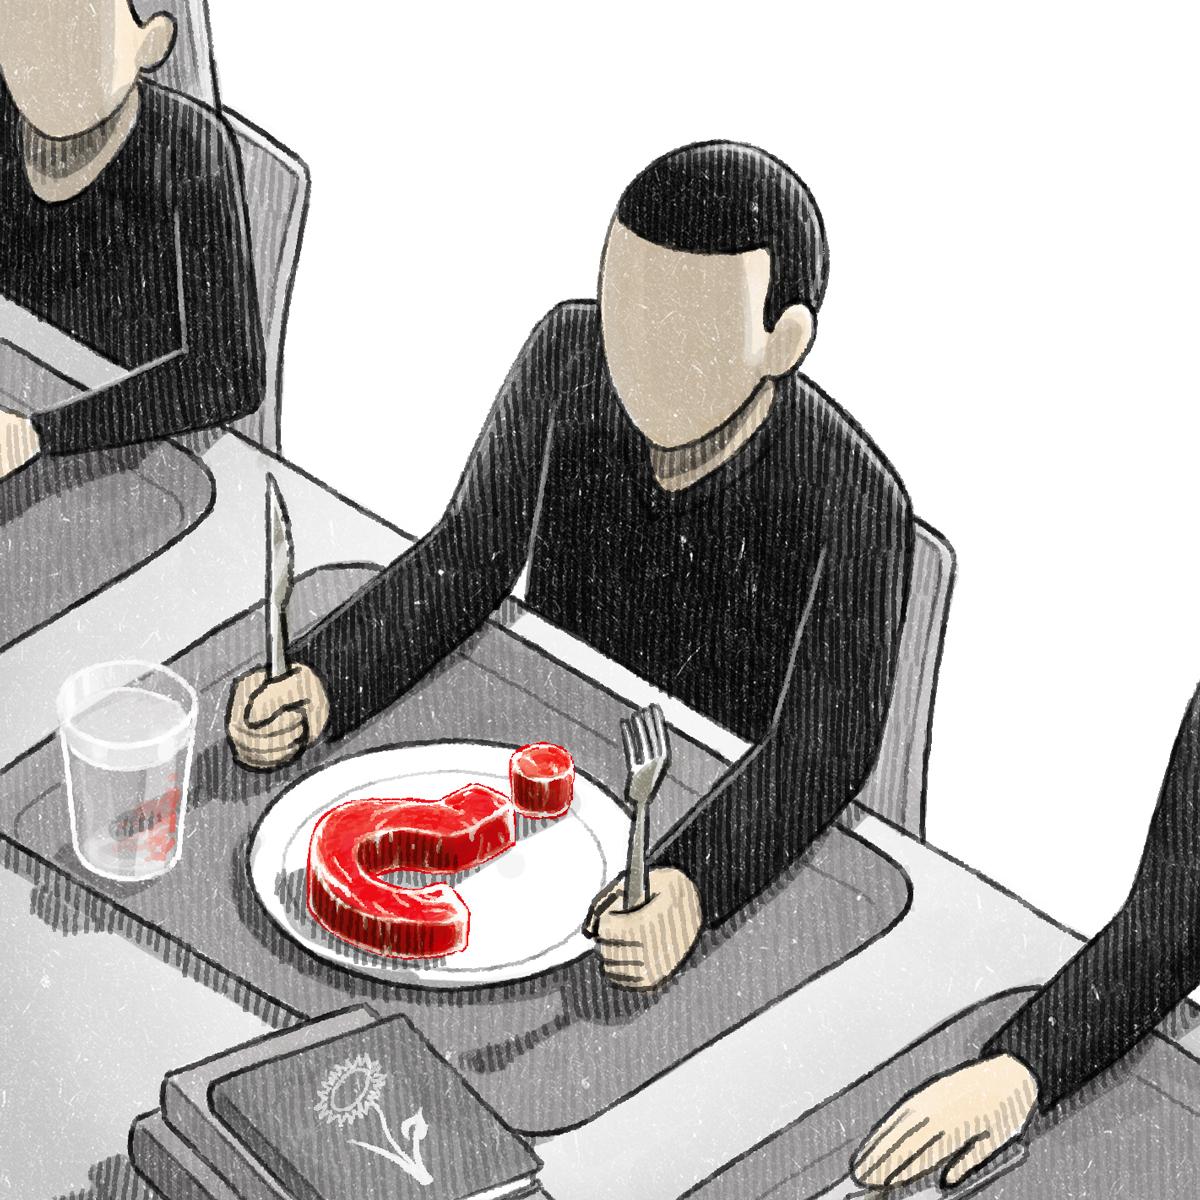 "Illustration for Campus NZZ 4/11/13 ""Vegan Student-Kantine"" by Danae Diaz"